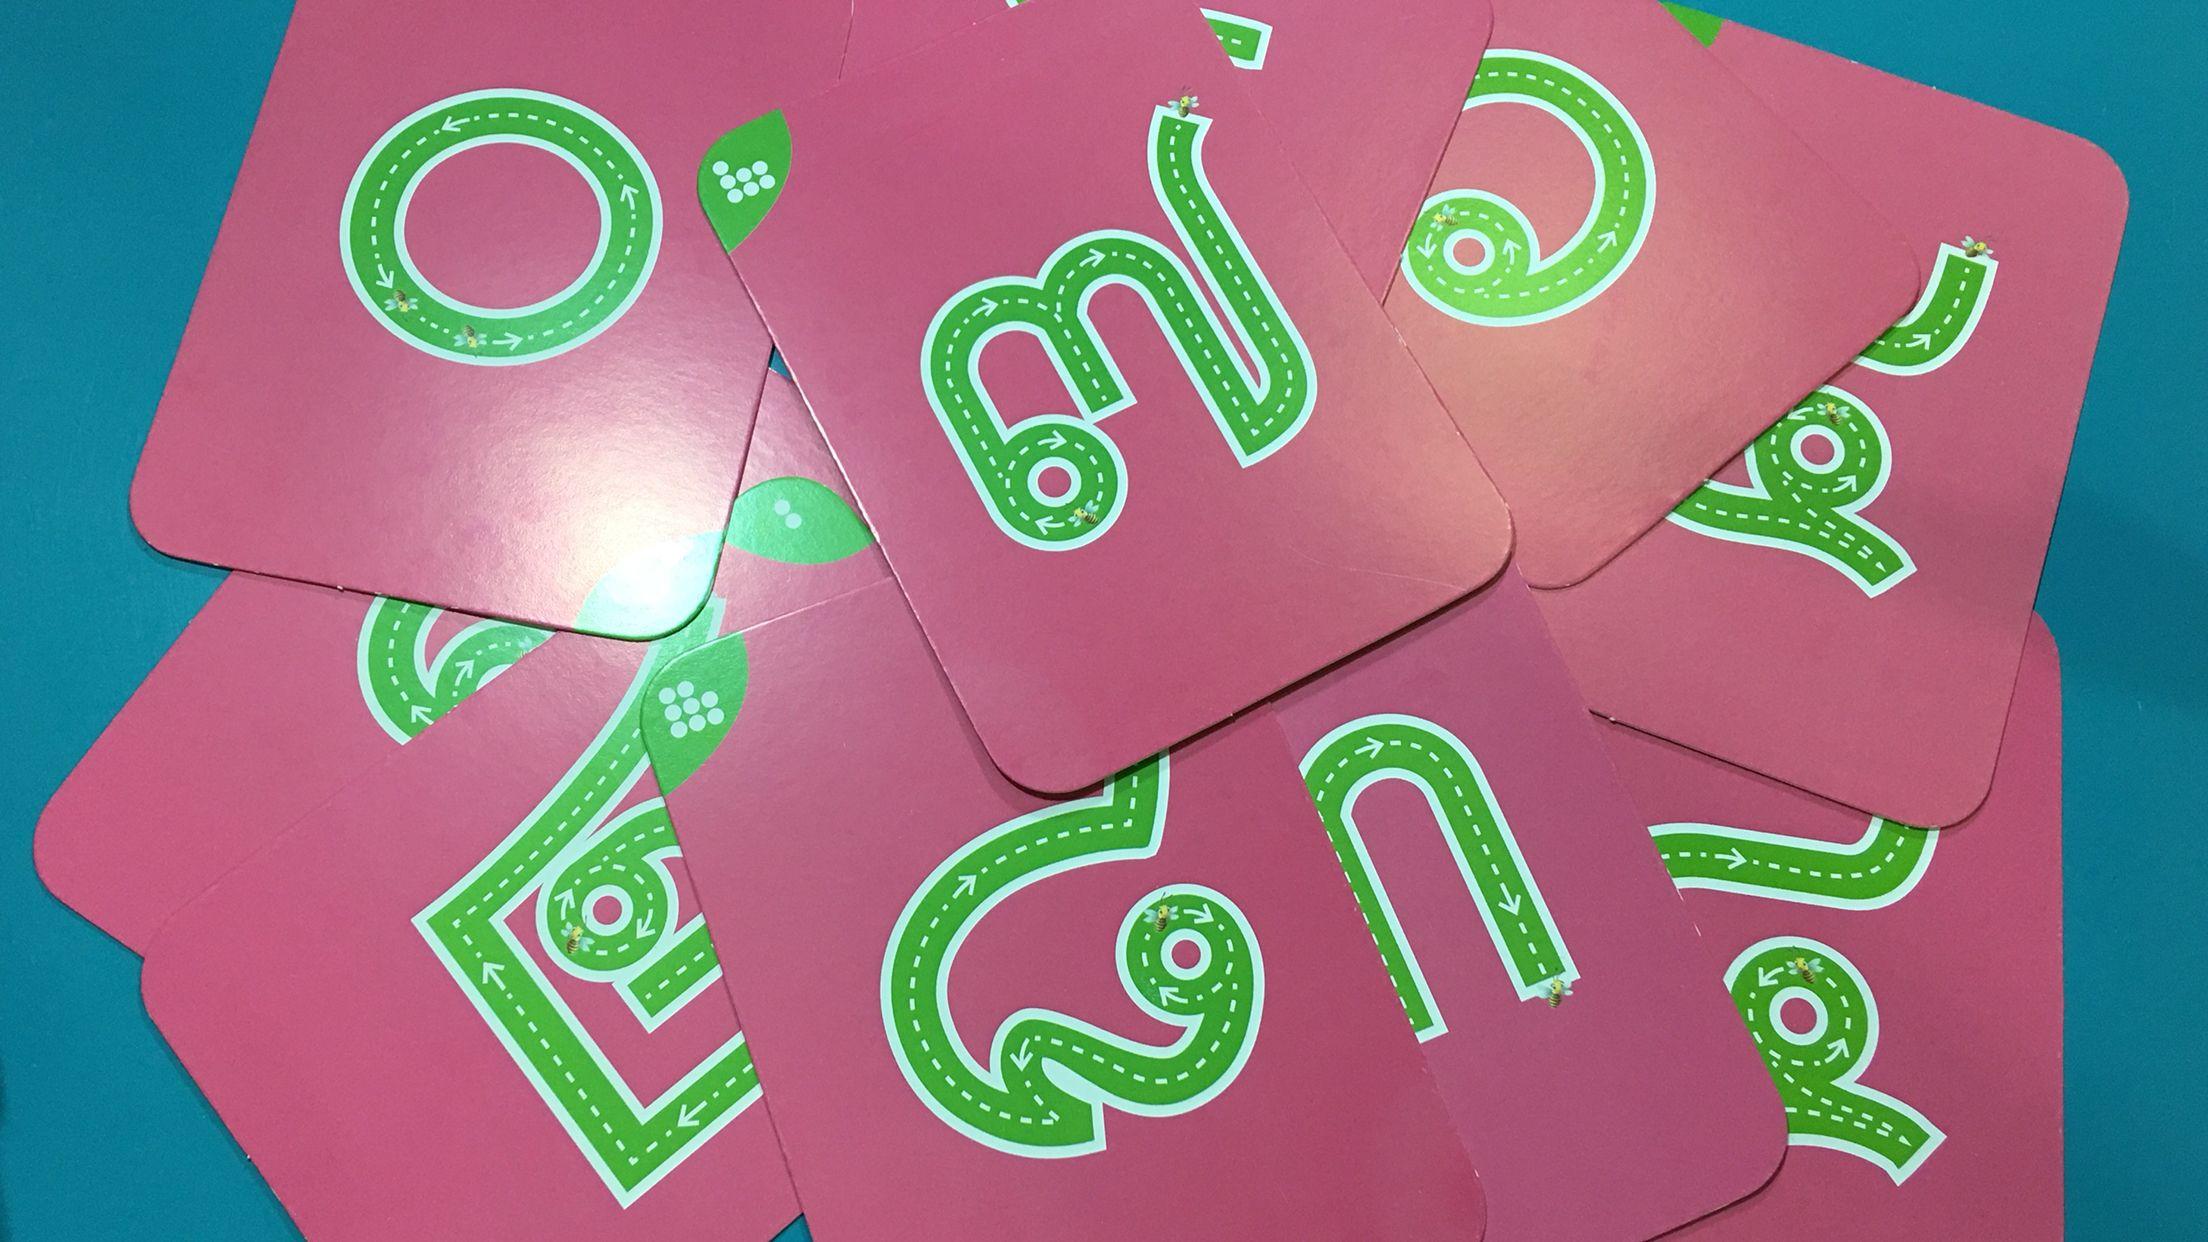 1 10 Number Cards For Kids